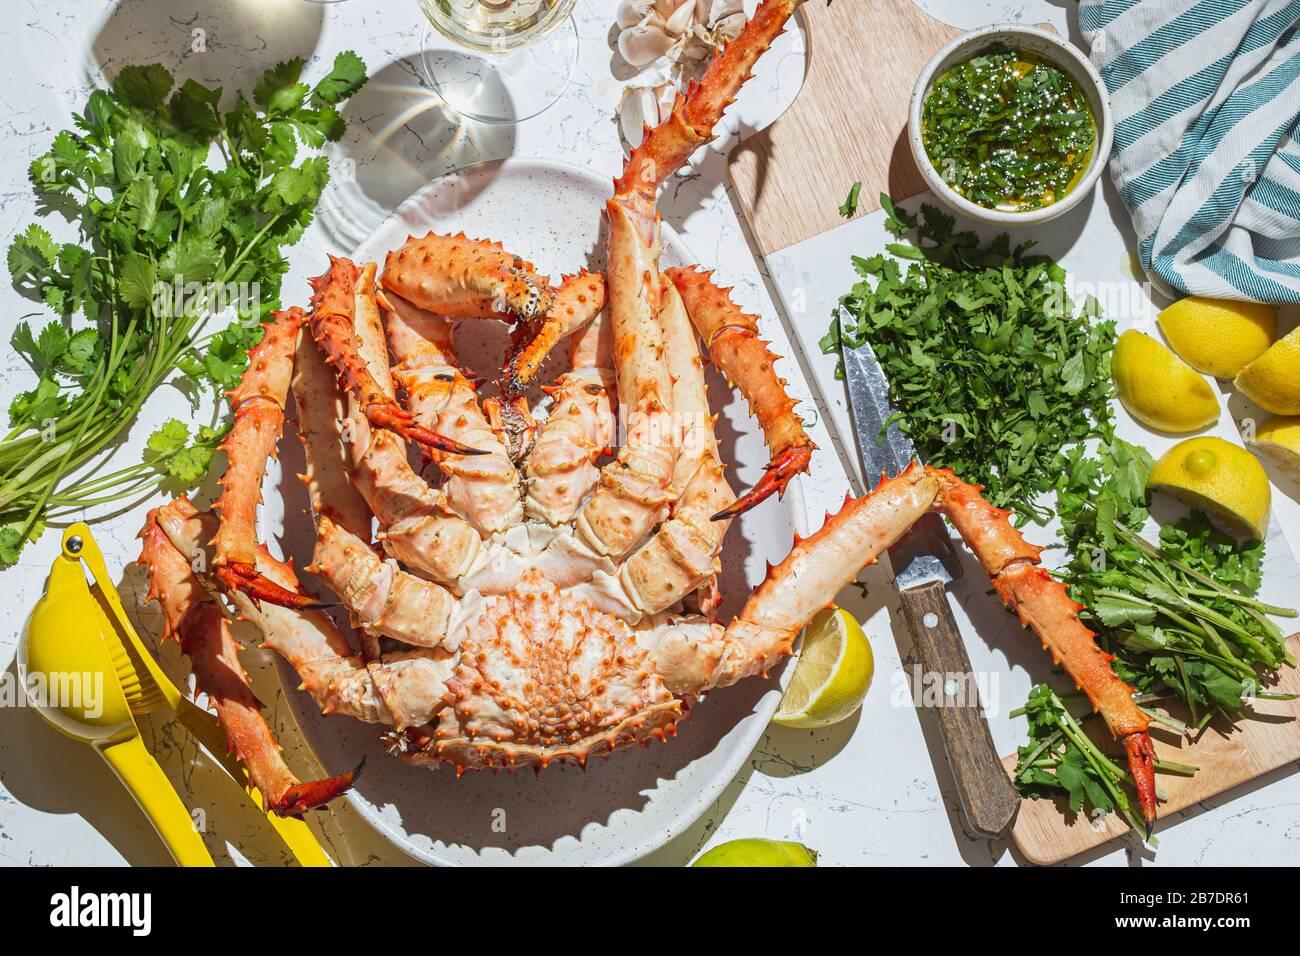 King Crab with herb lemon sauce and ...